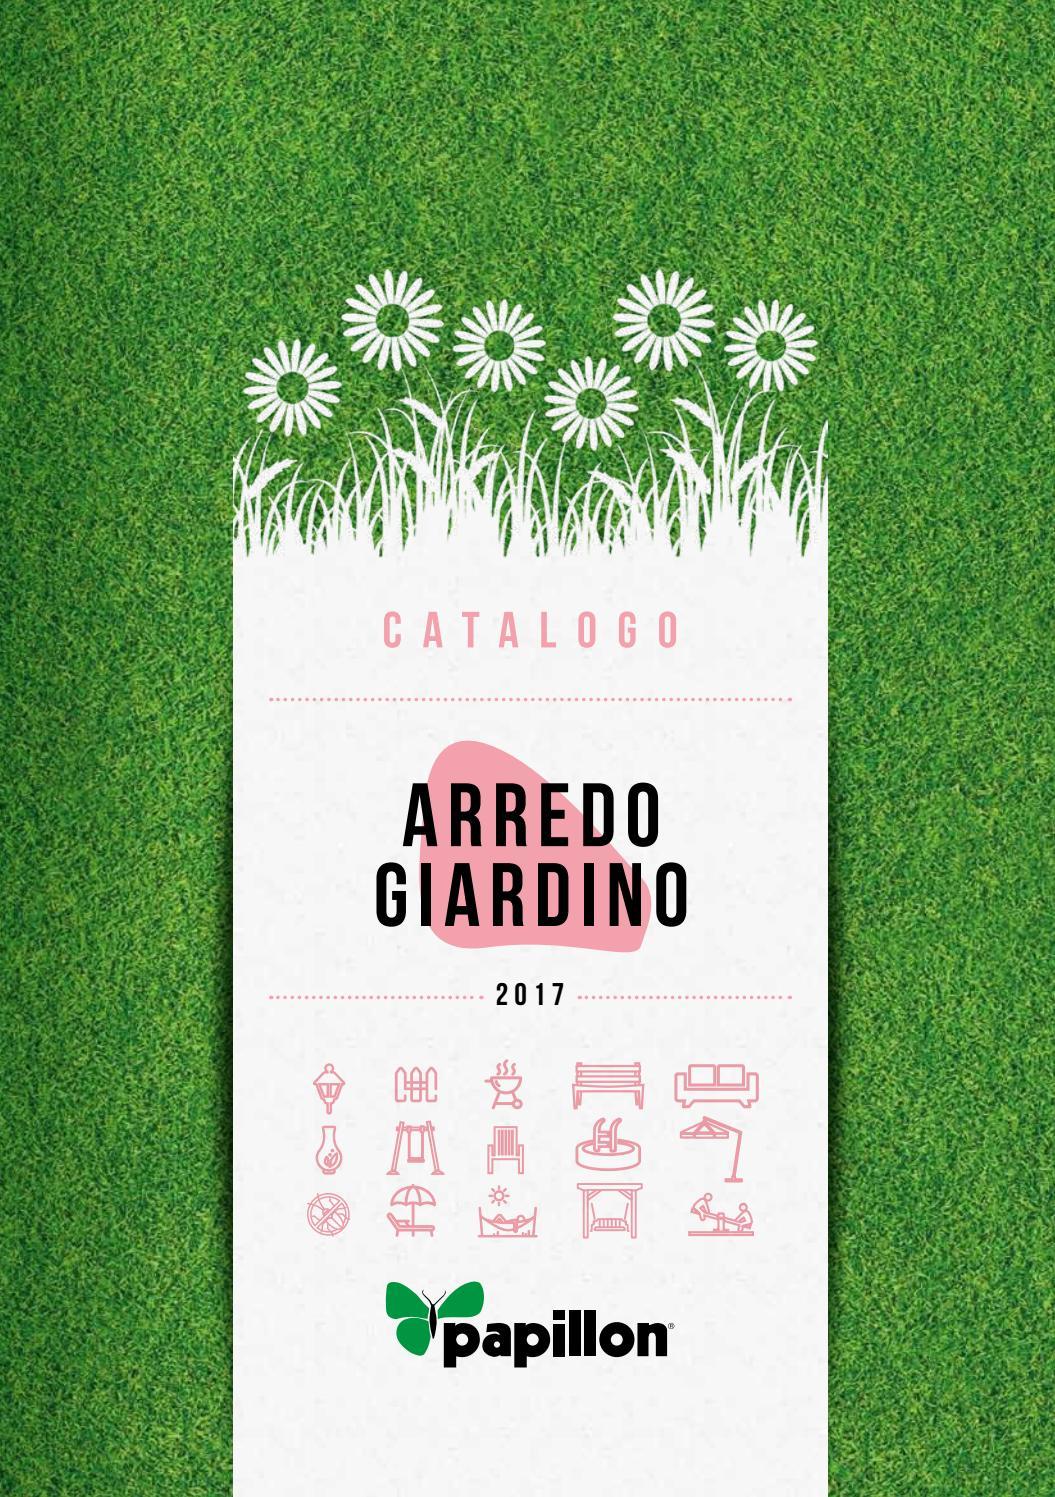 Catalogo arredo giardino by oggiweb srl issuu for Catalogo arredo giardino